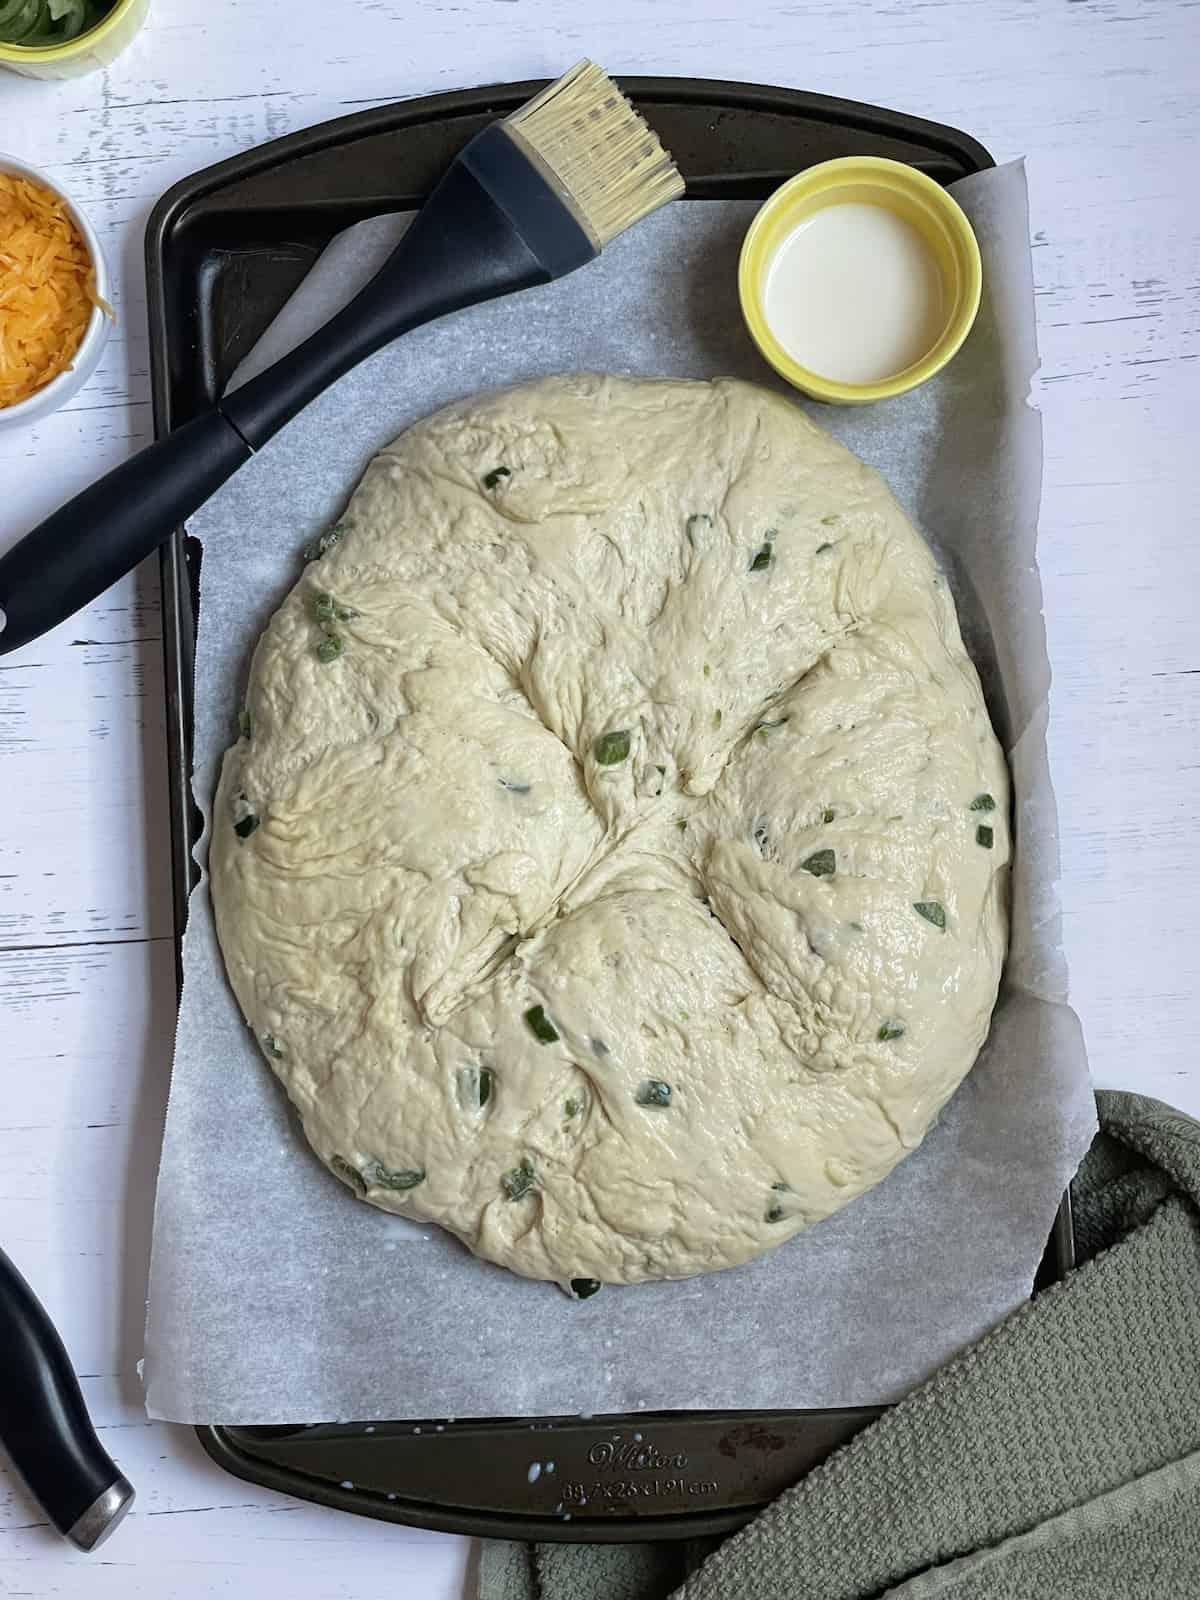 dough resting on a baking sheet